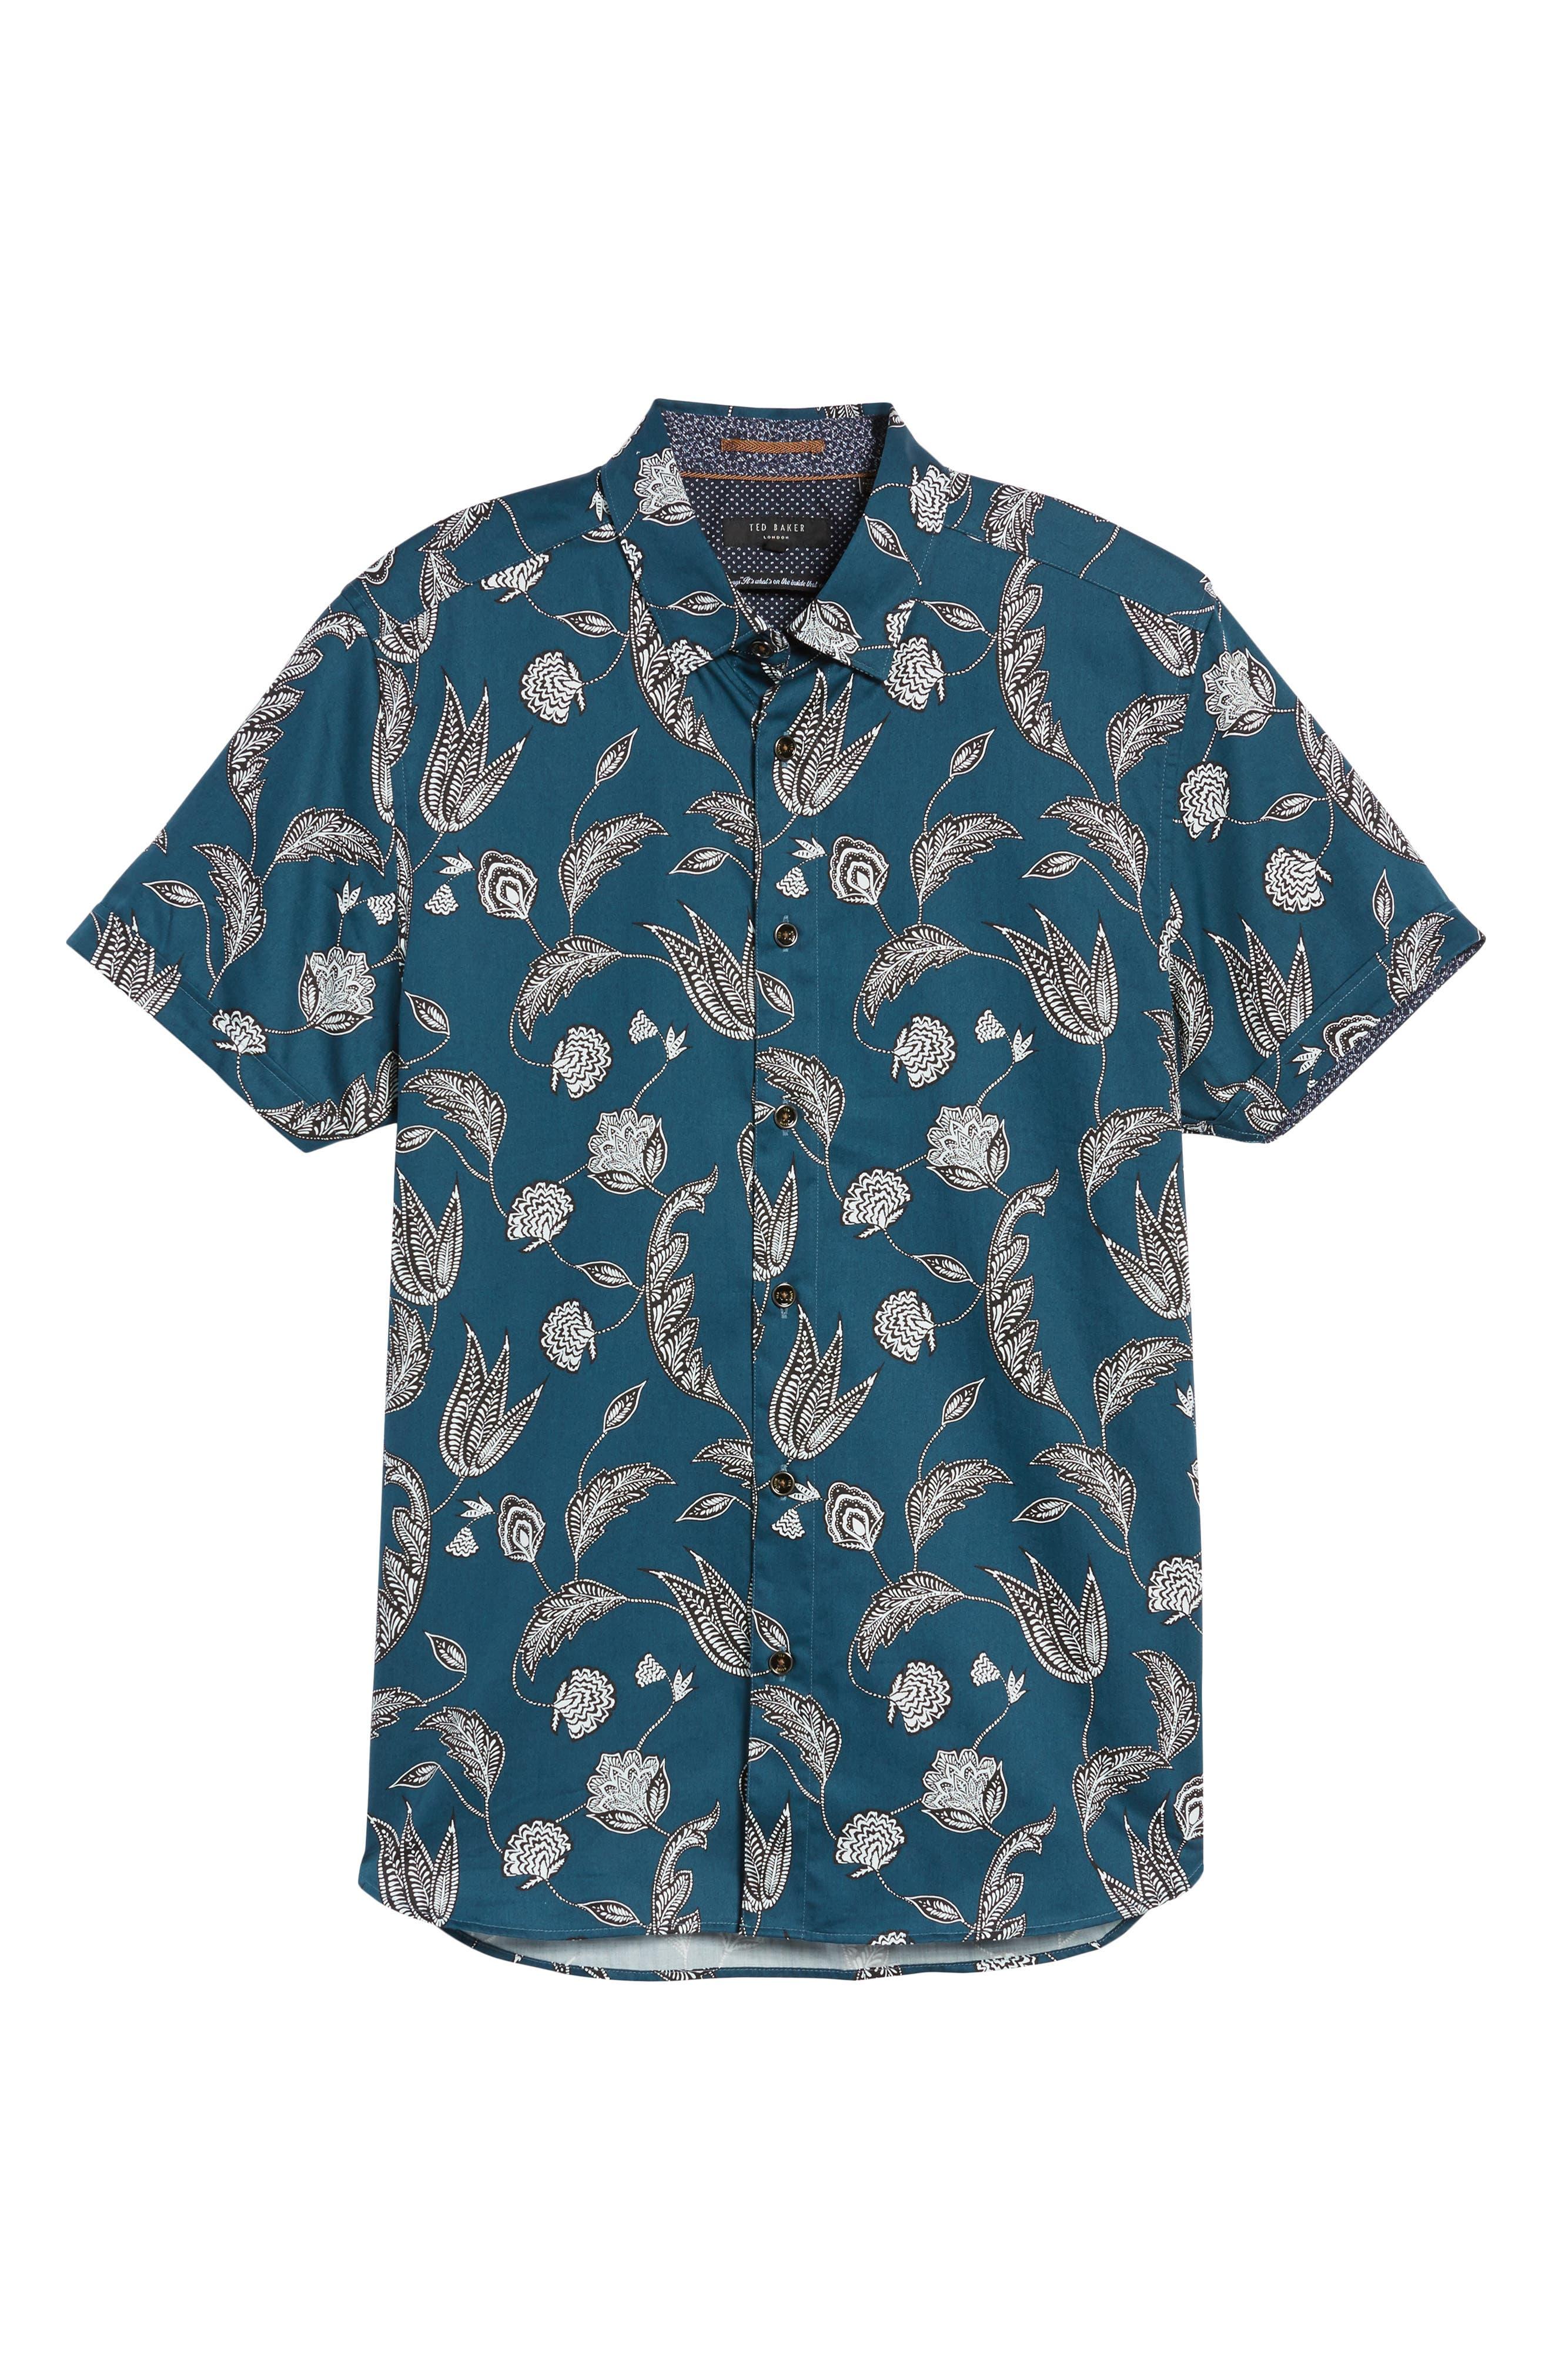 UTKU Floral Sport Shirt,                             Alternate thumbnail 6, color,                             Dark Green